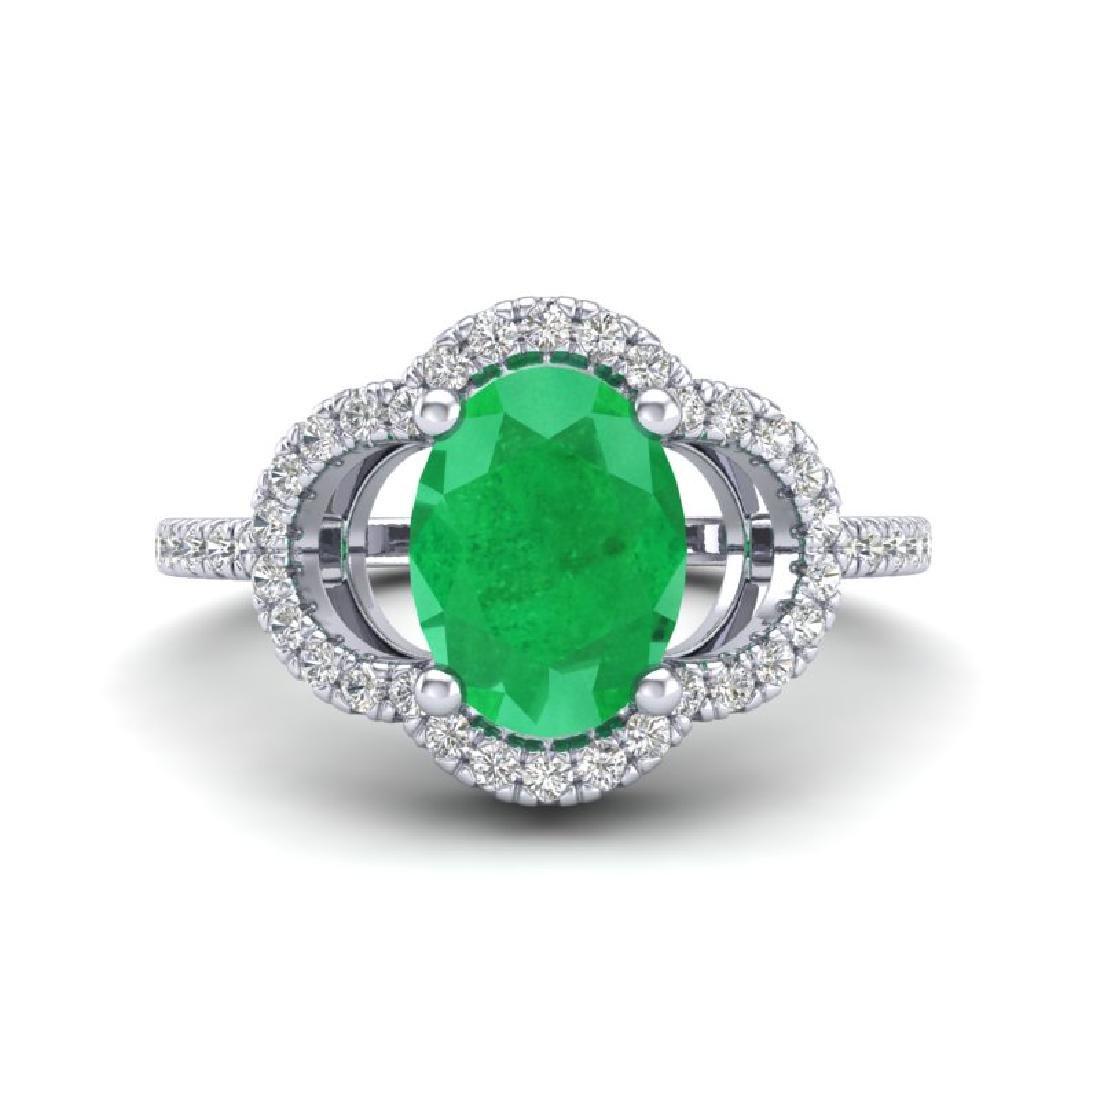 2 CTW Emerald & Micro Pave VS/SI Diamond Ring 10K White